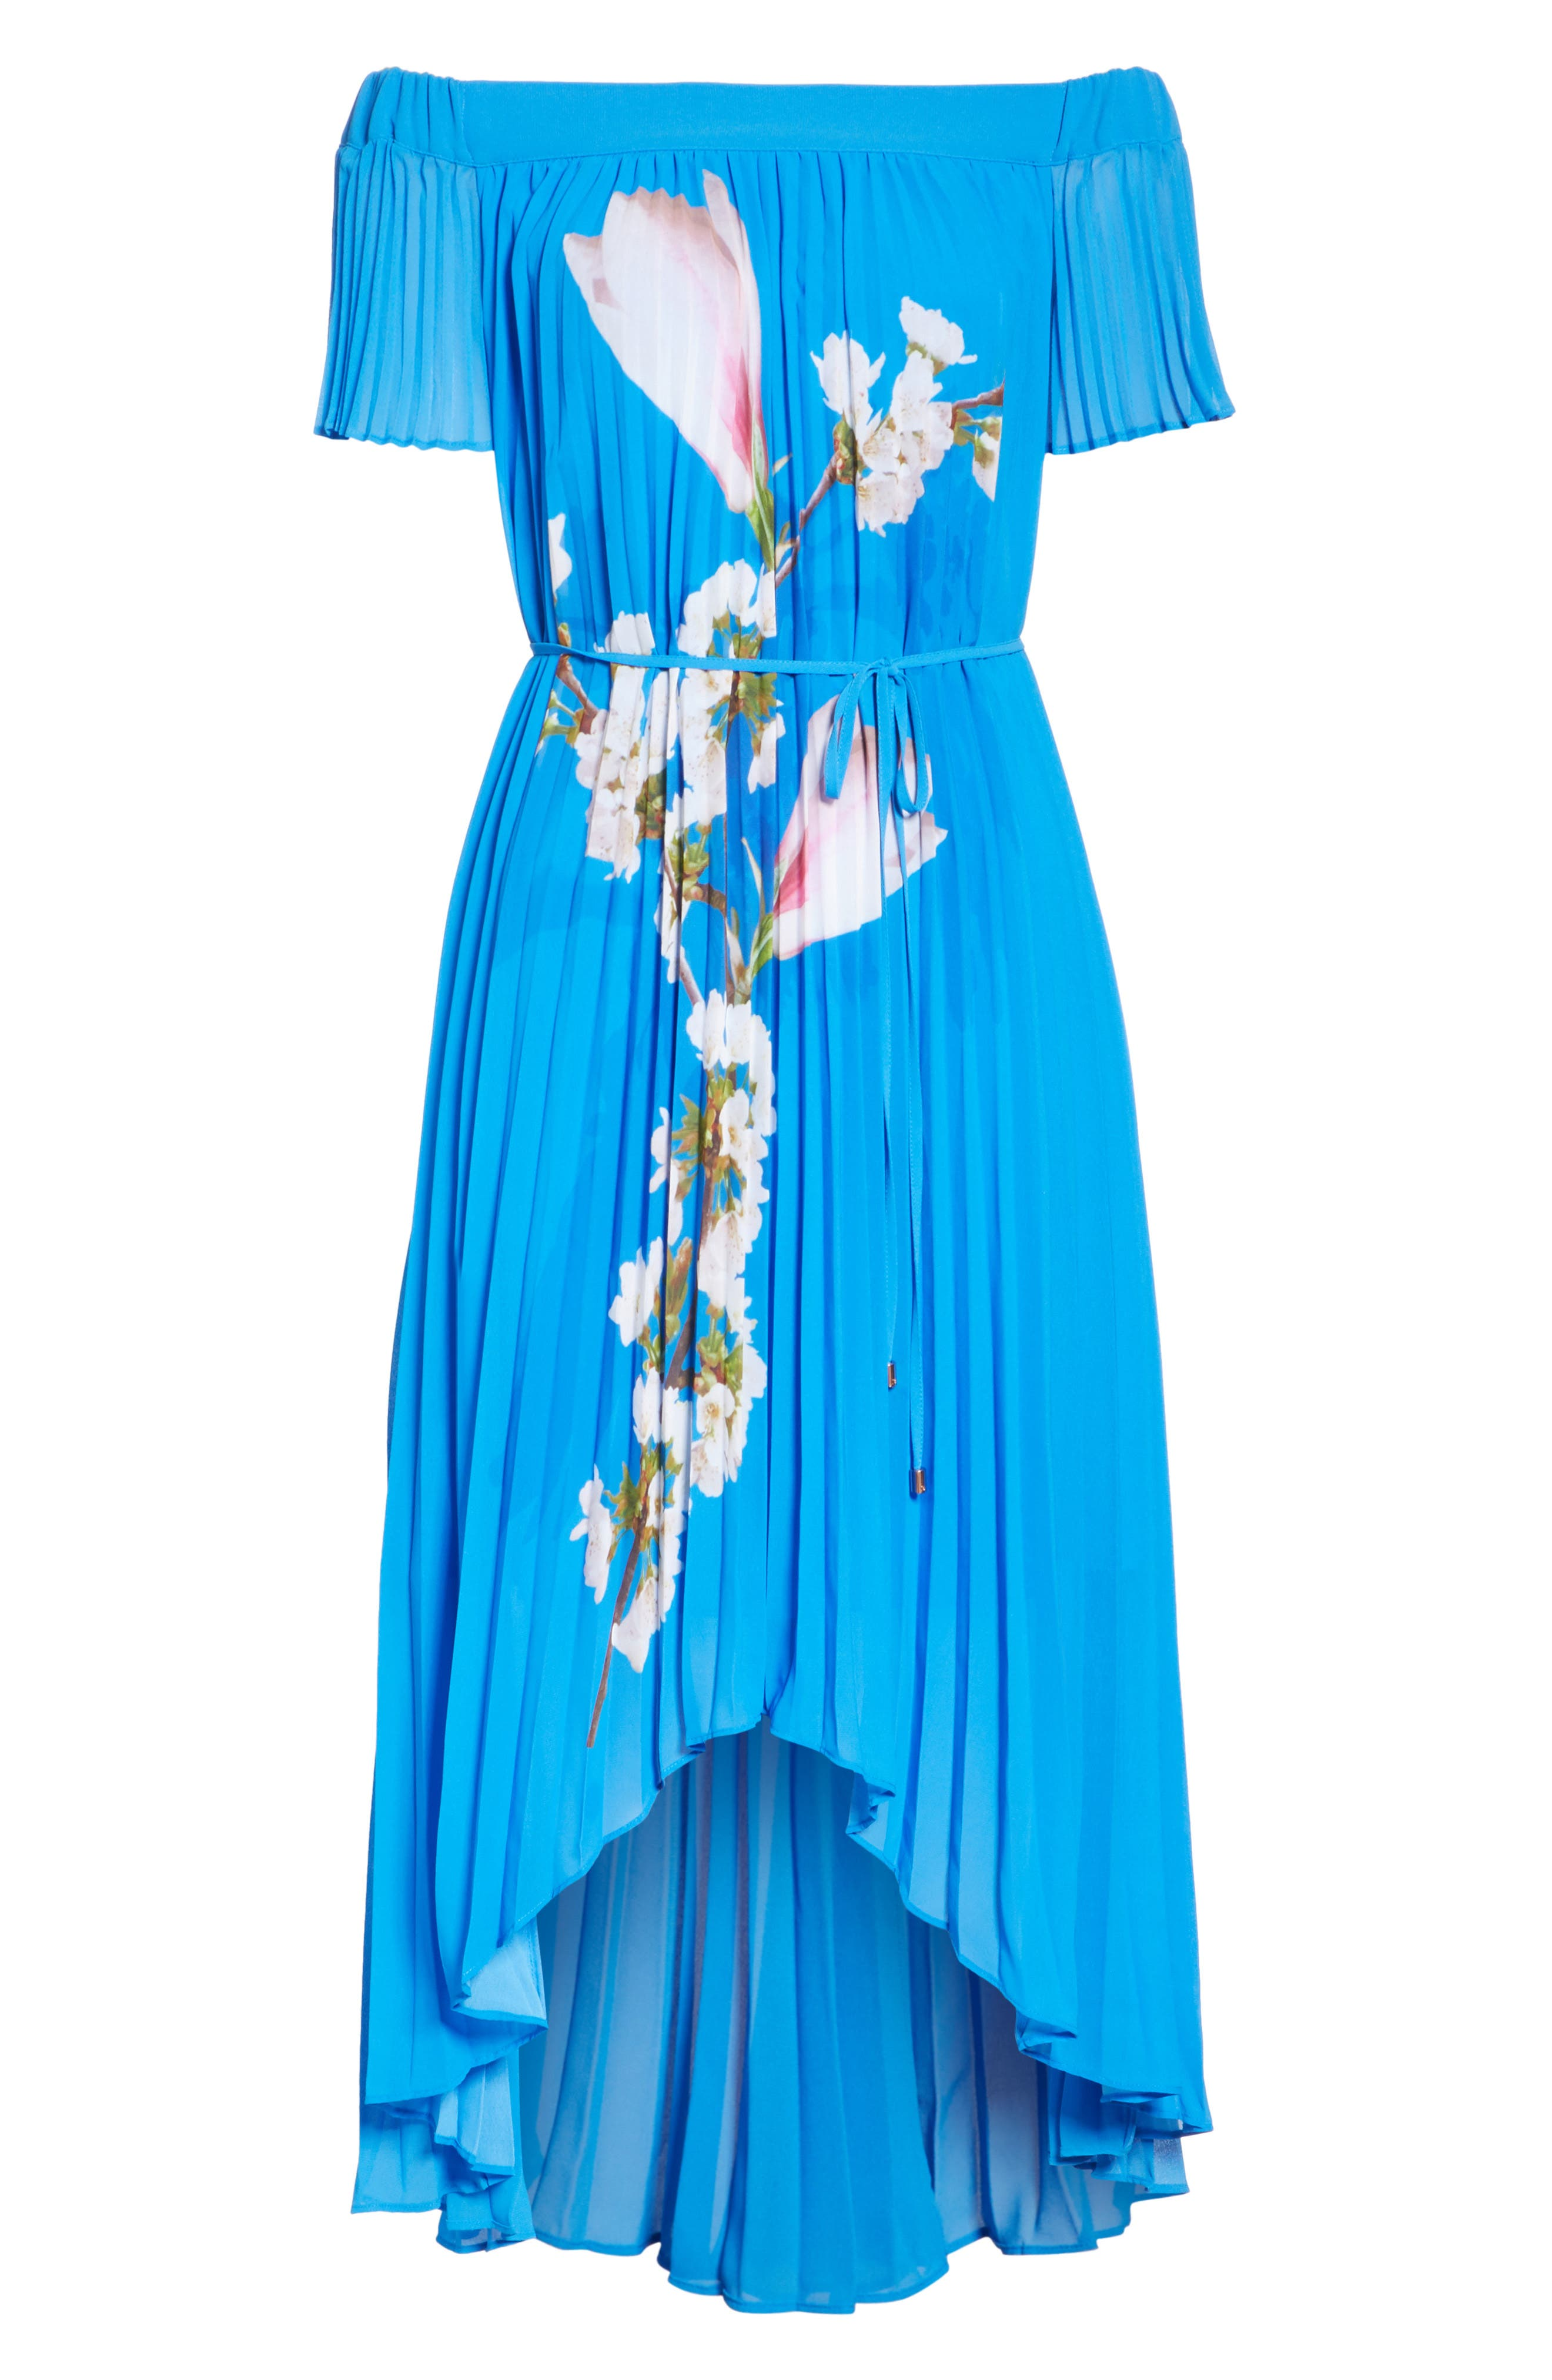 Harmony Pleat High/Low Dress,                             Alternate thumbnail 6, color,                             Bright Blue